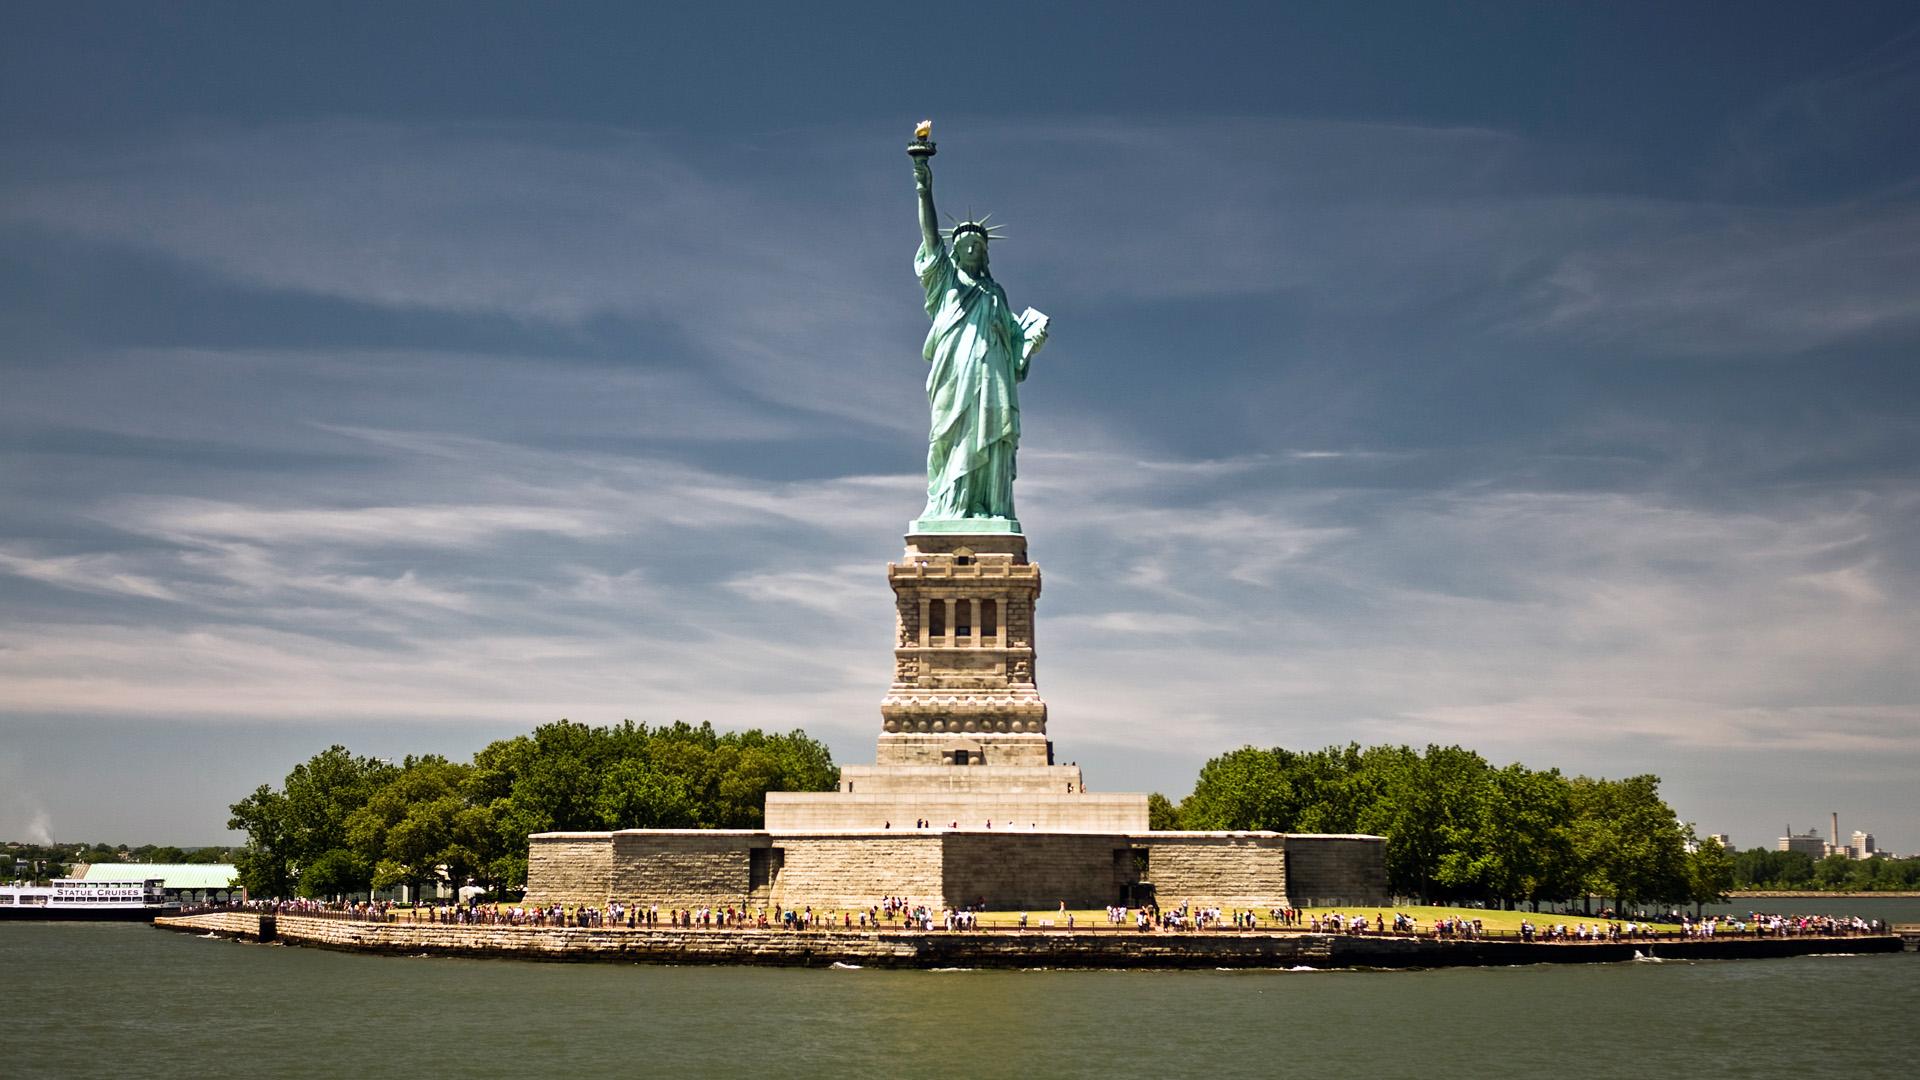 Wondrous Statue Of Liberty Wallpaper   Travel HD Wallpapers 1920x1080